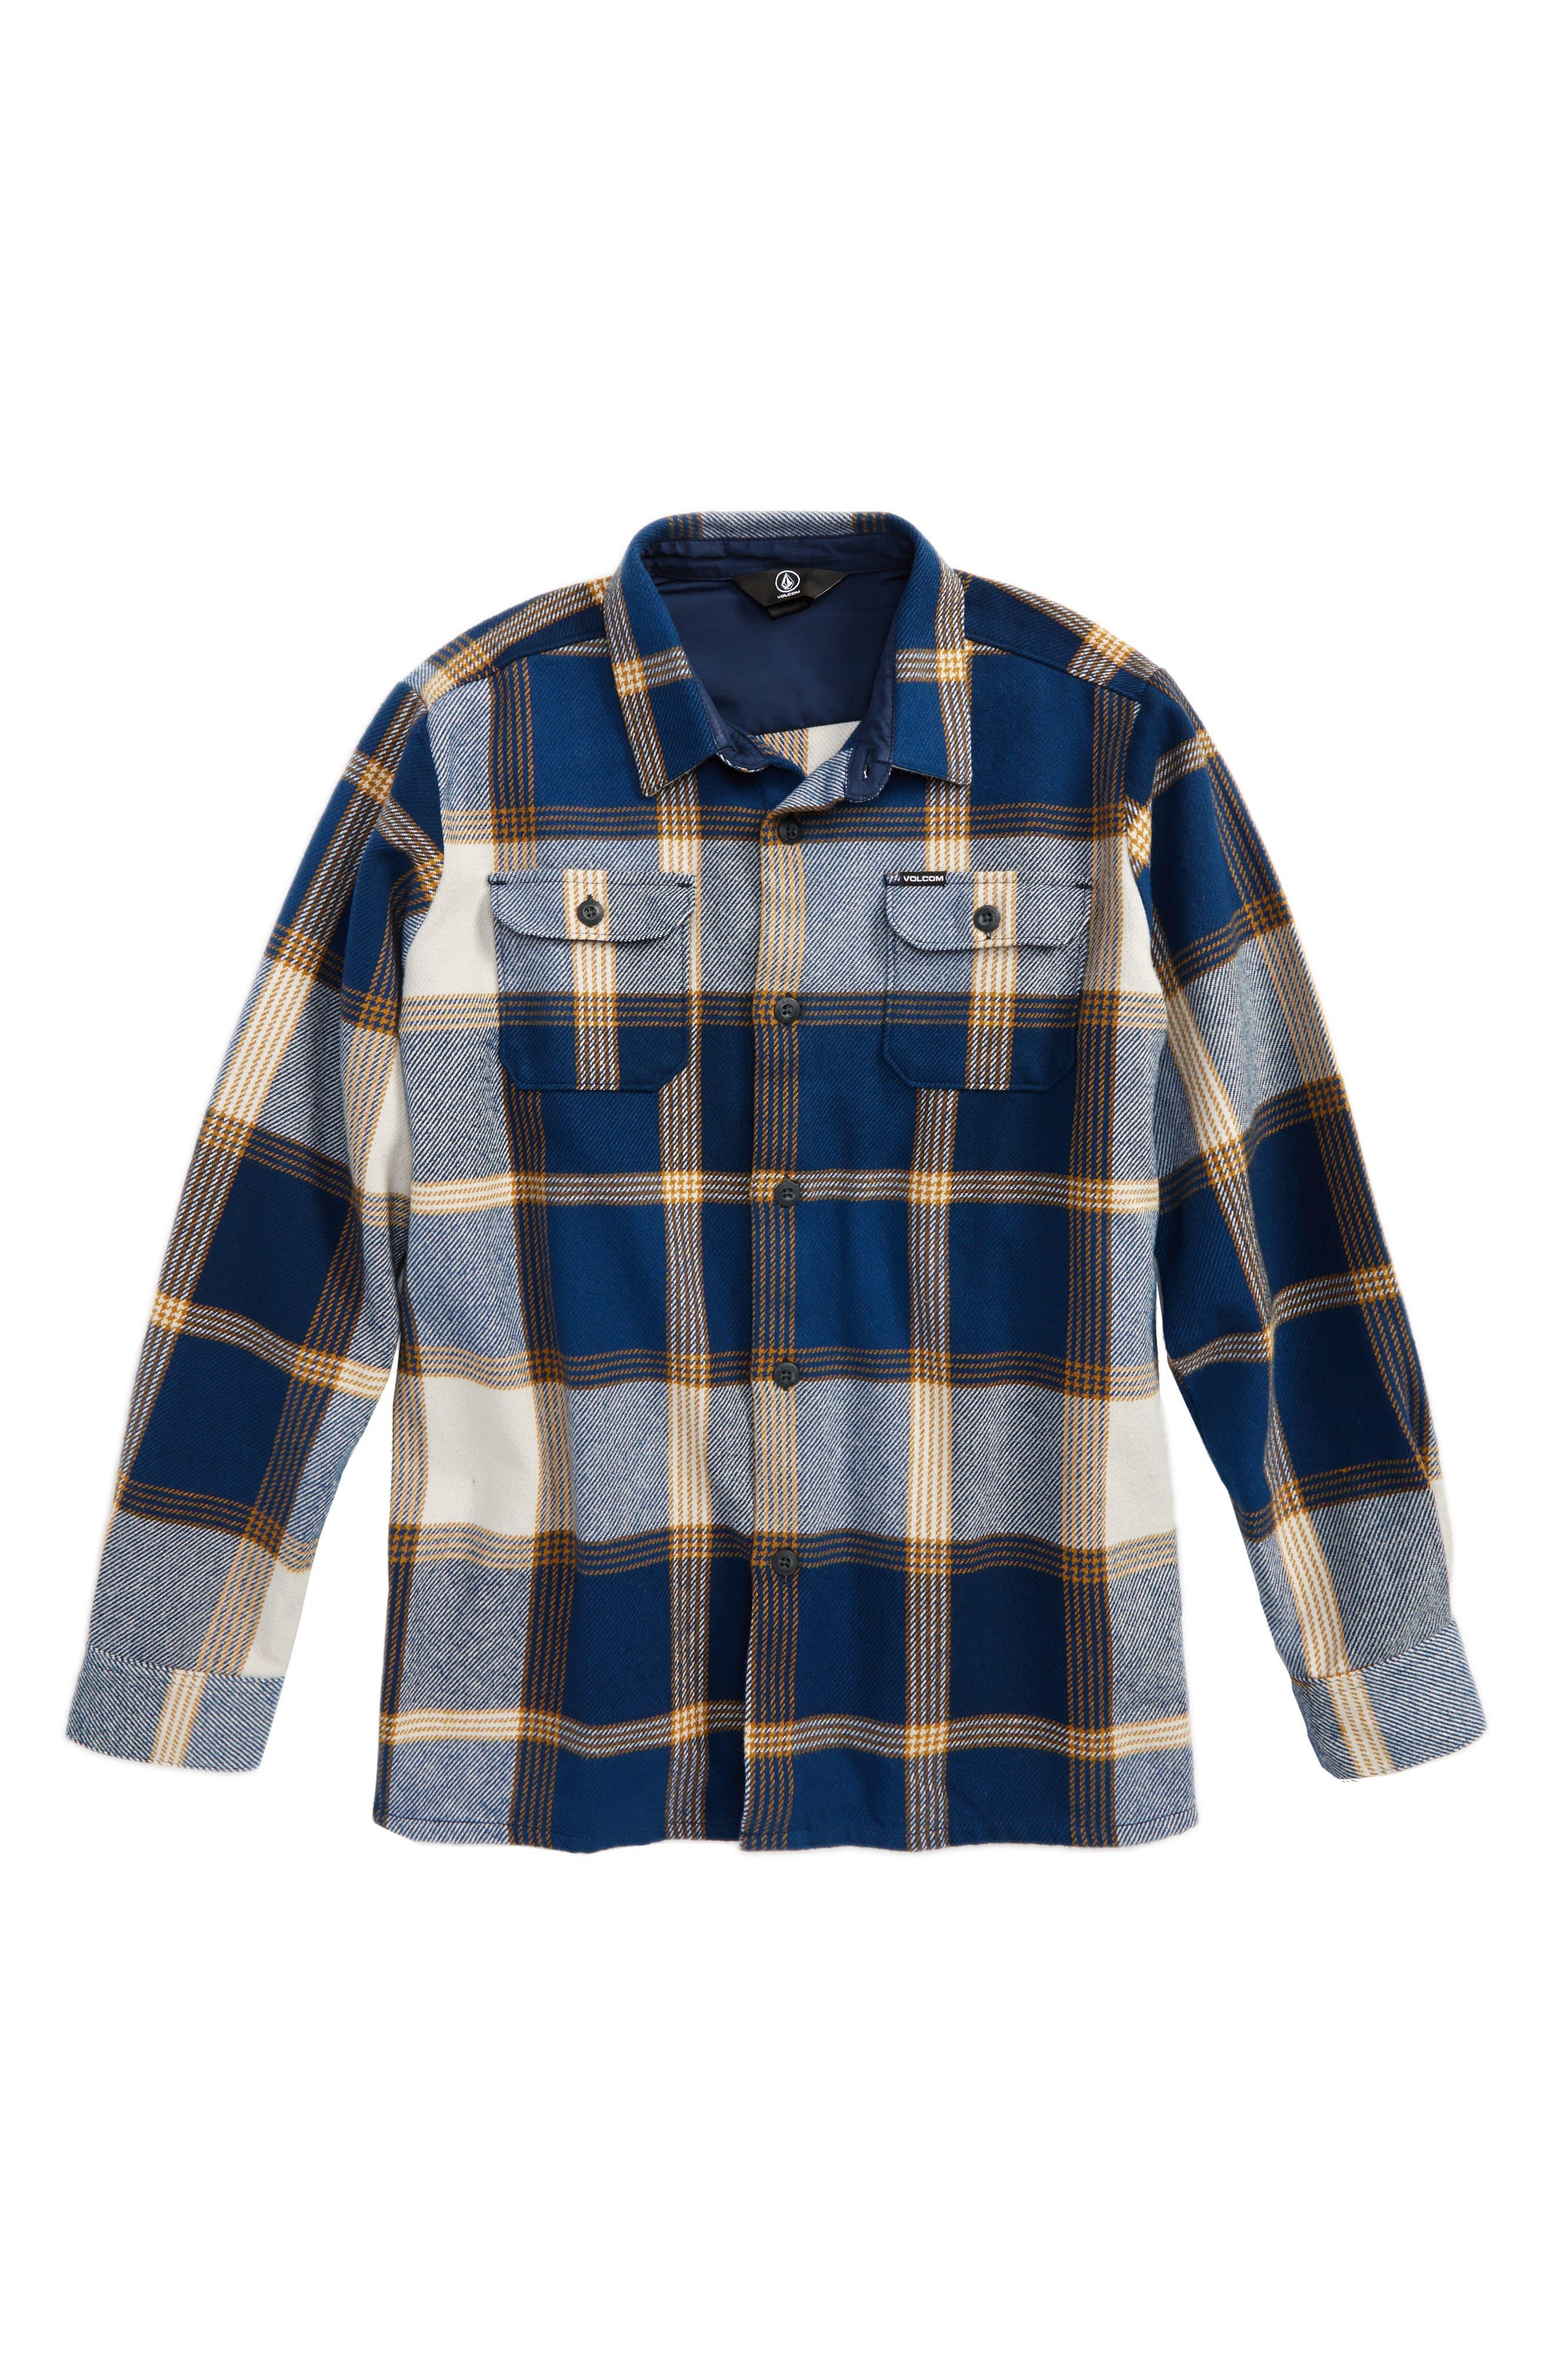 Alternate Image 1 Selected - Volcom Heavy Daze Plaid Flannel Shirt Jacket (Big Boys)